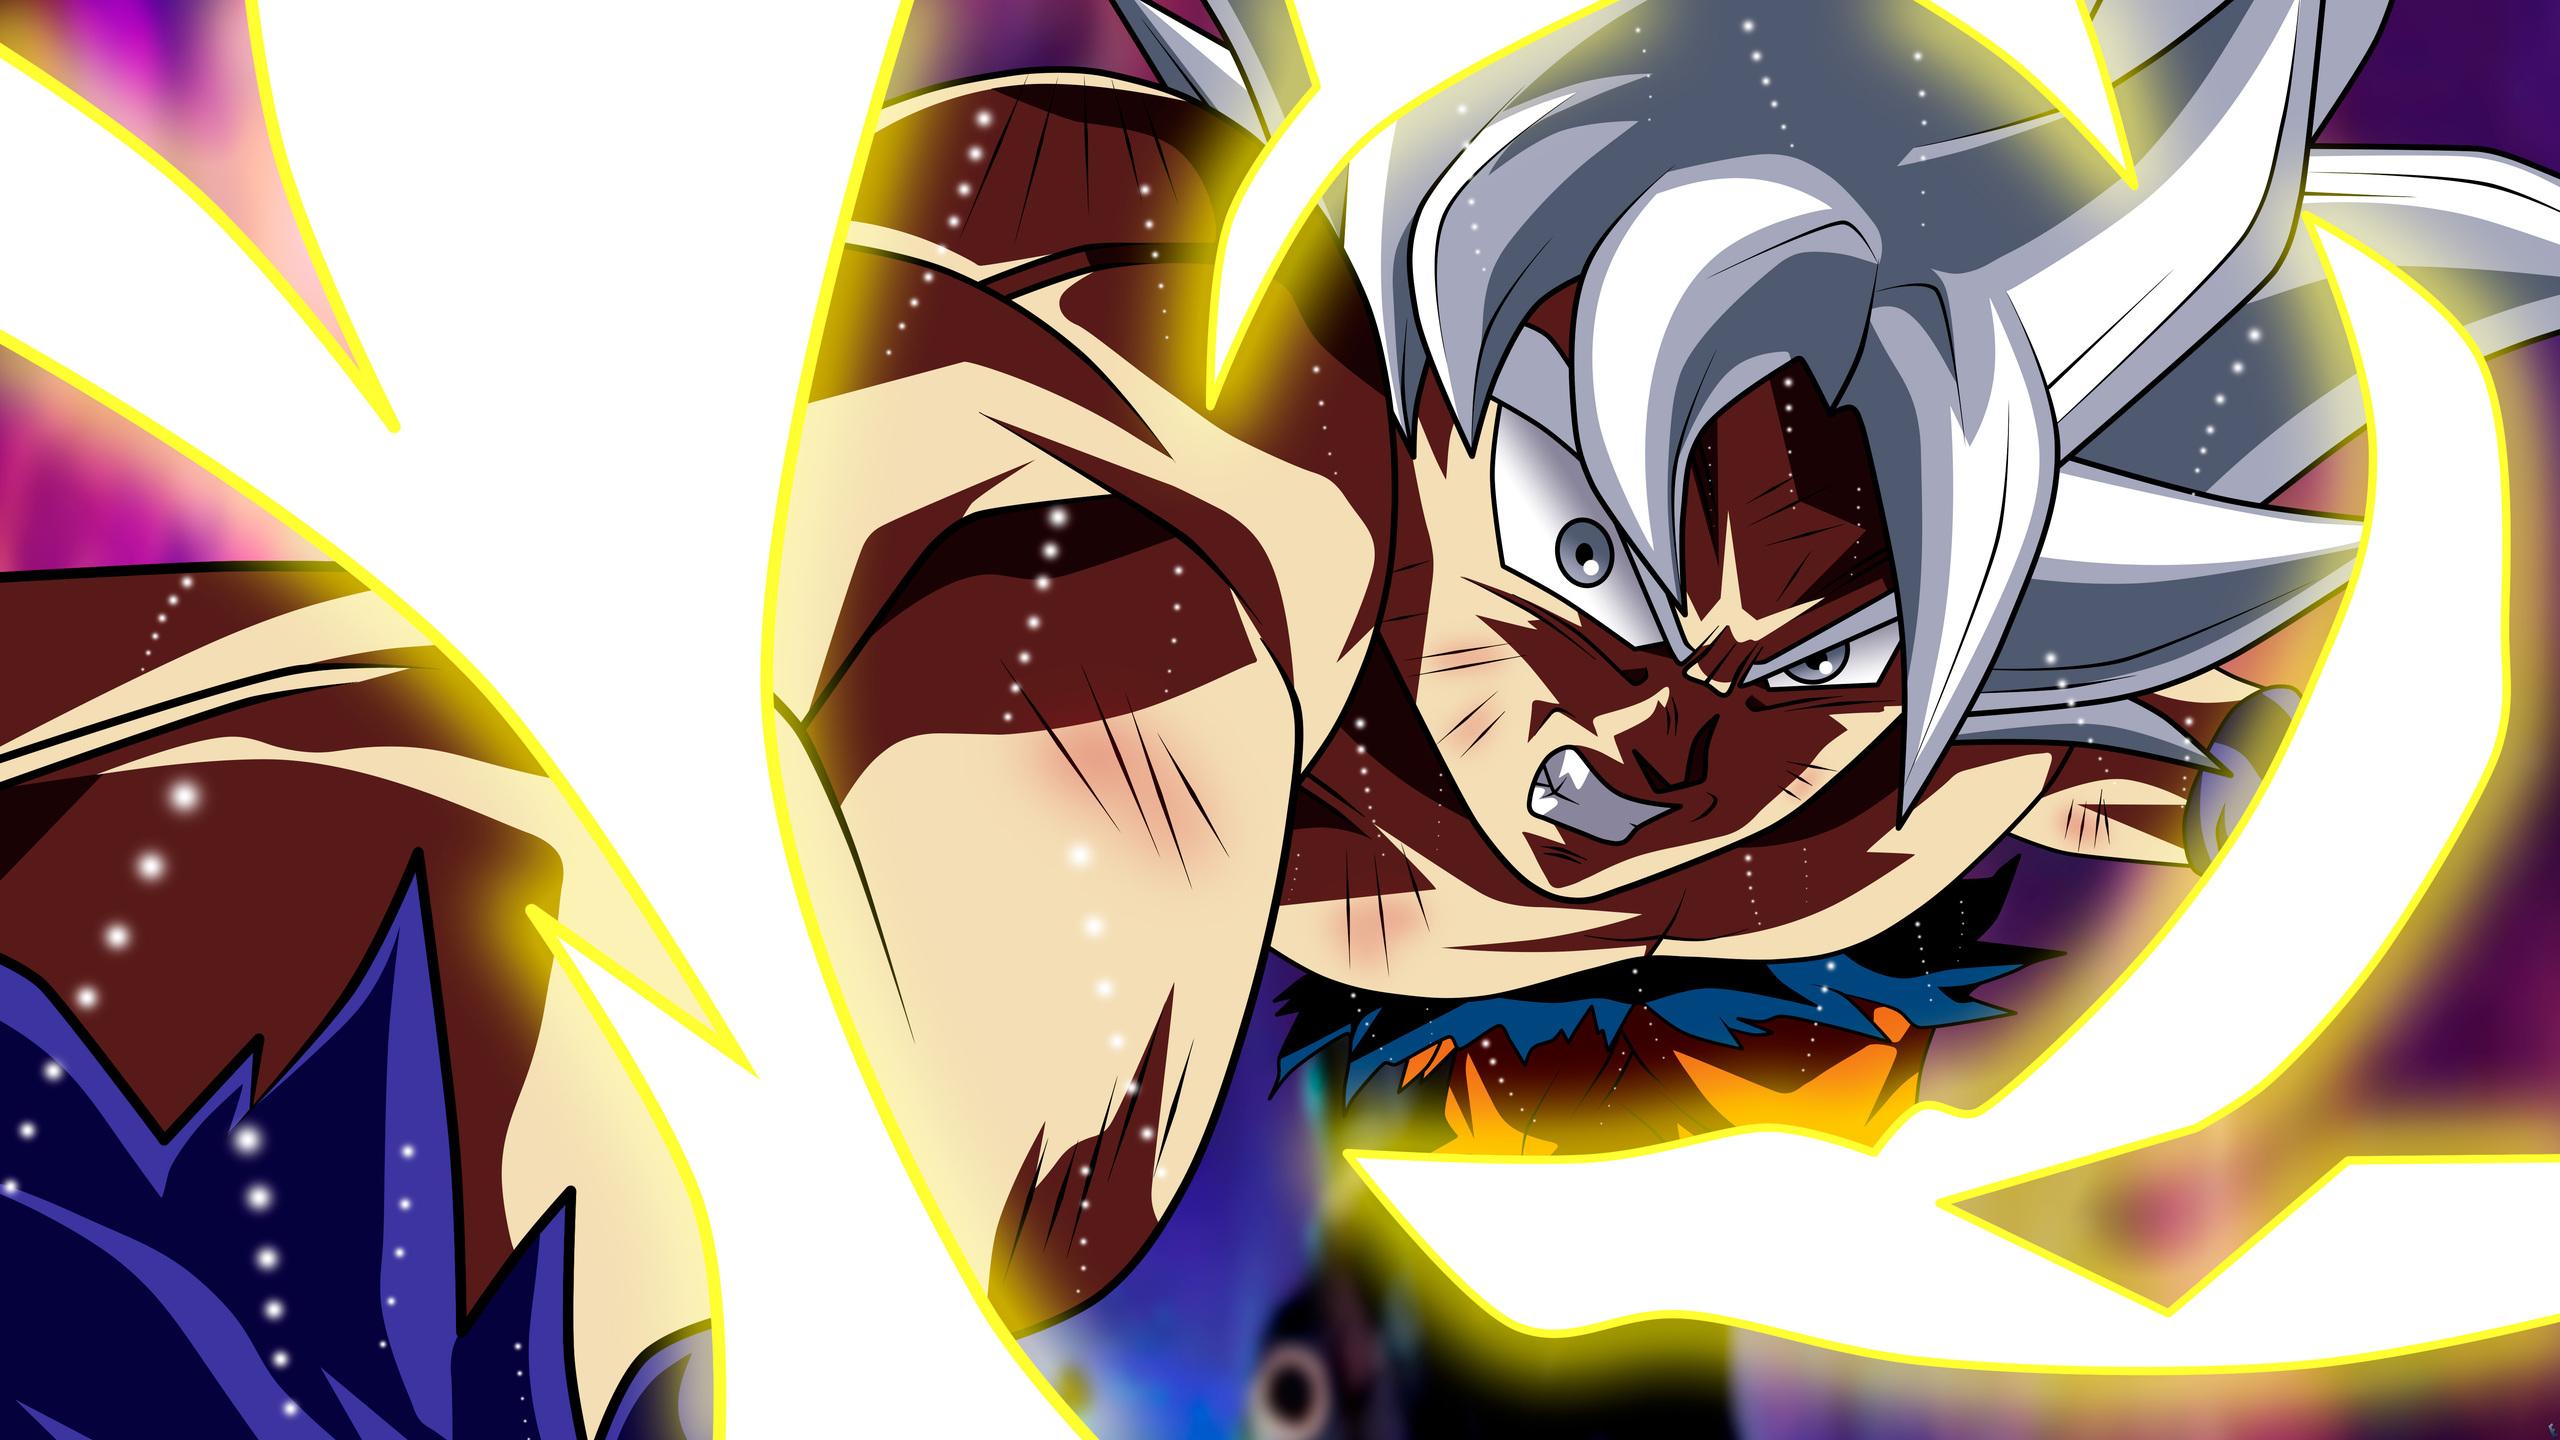 2560x1440 5k Goku Migatte No Gokui Dominado 1440p Resolution Hd 4k